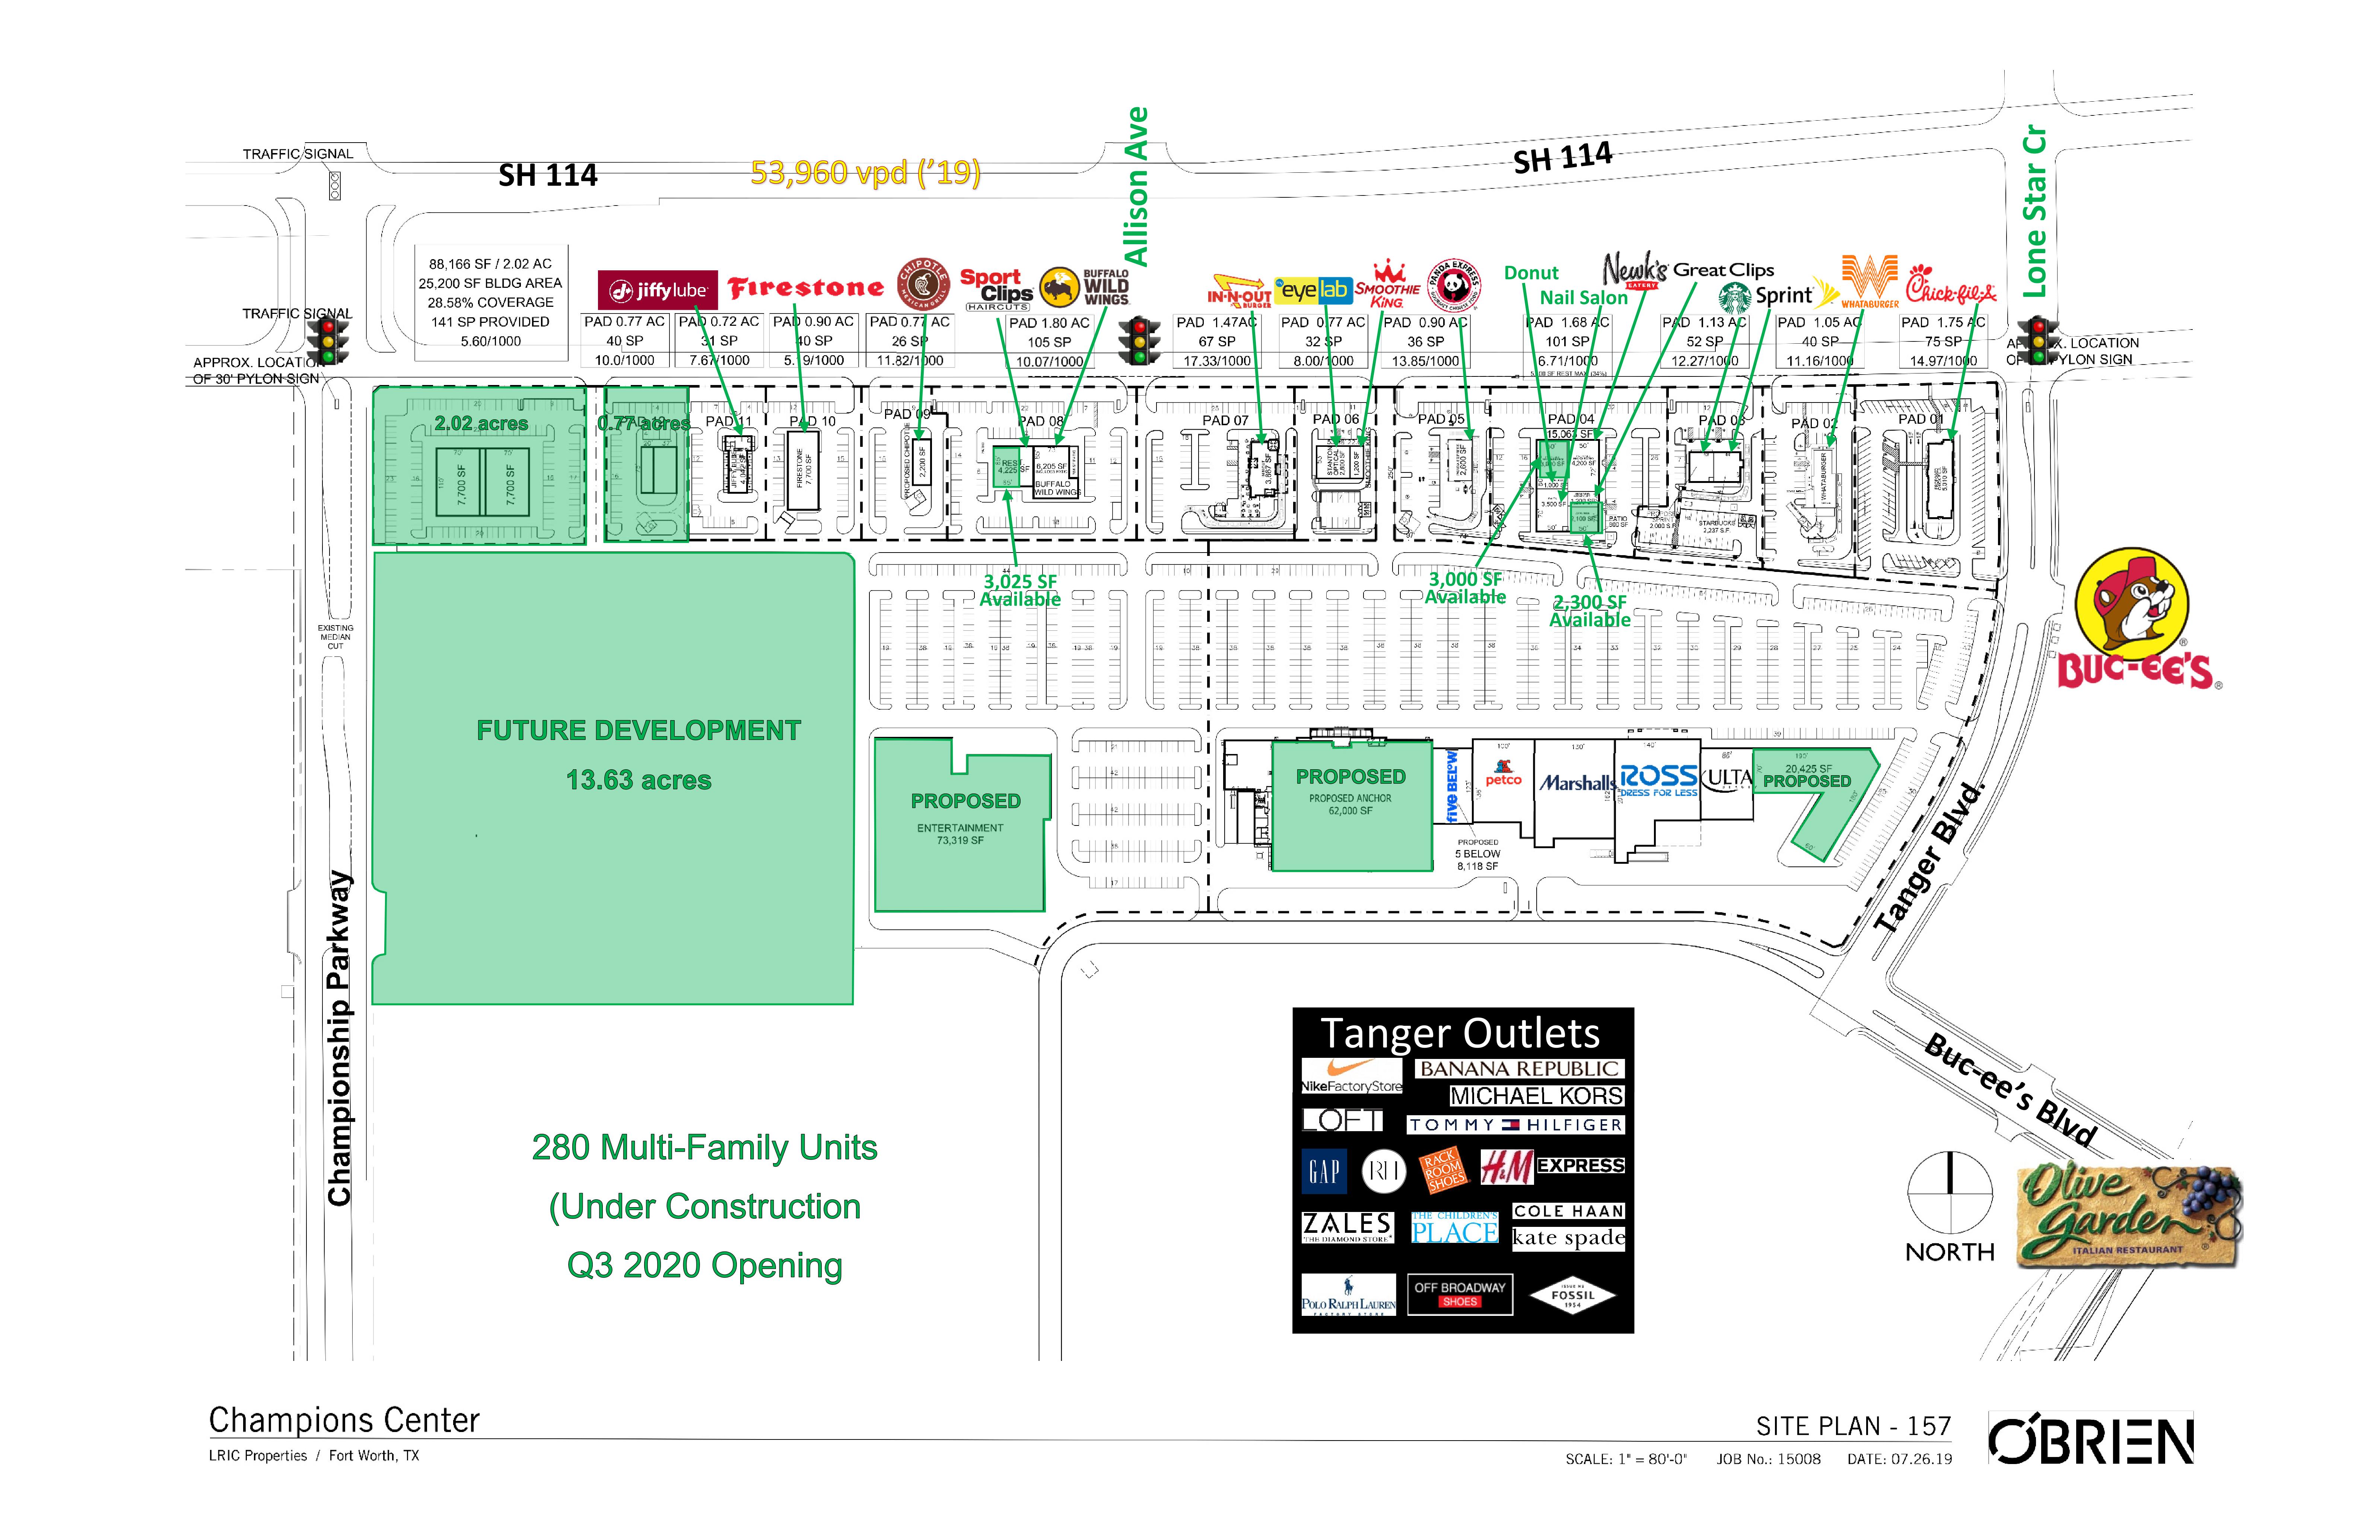 Champions Center: site plan